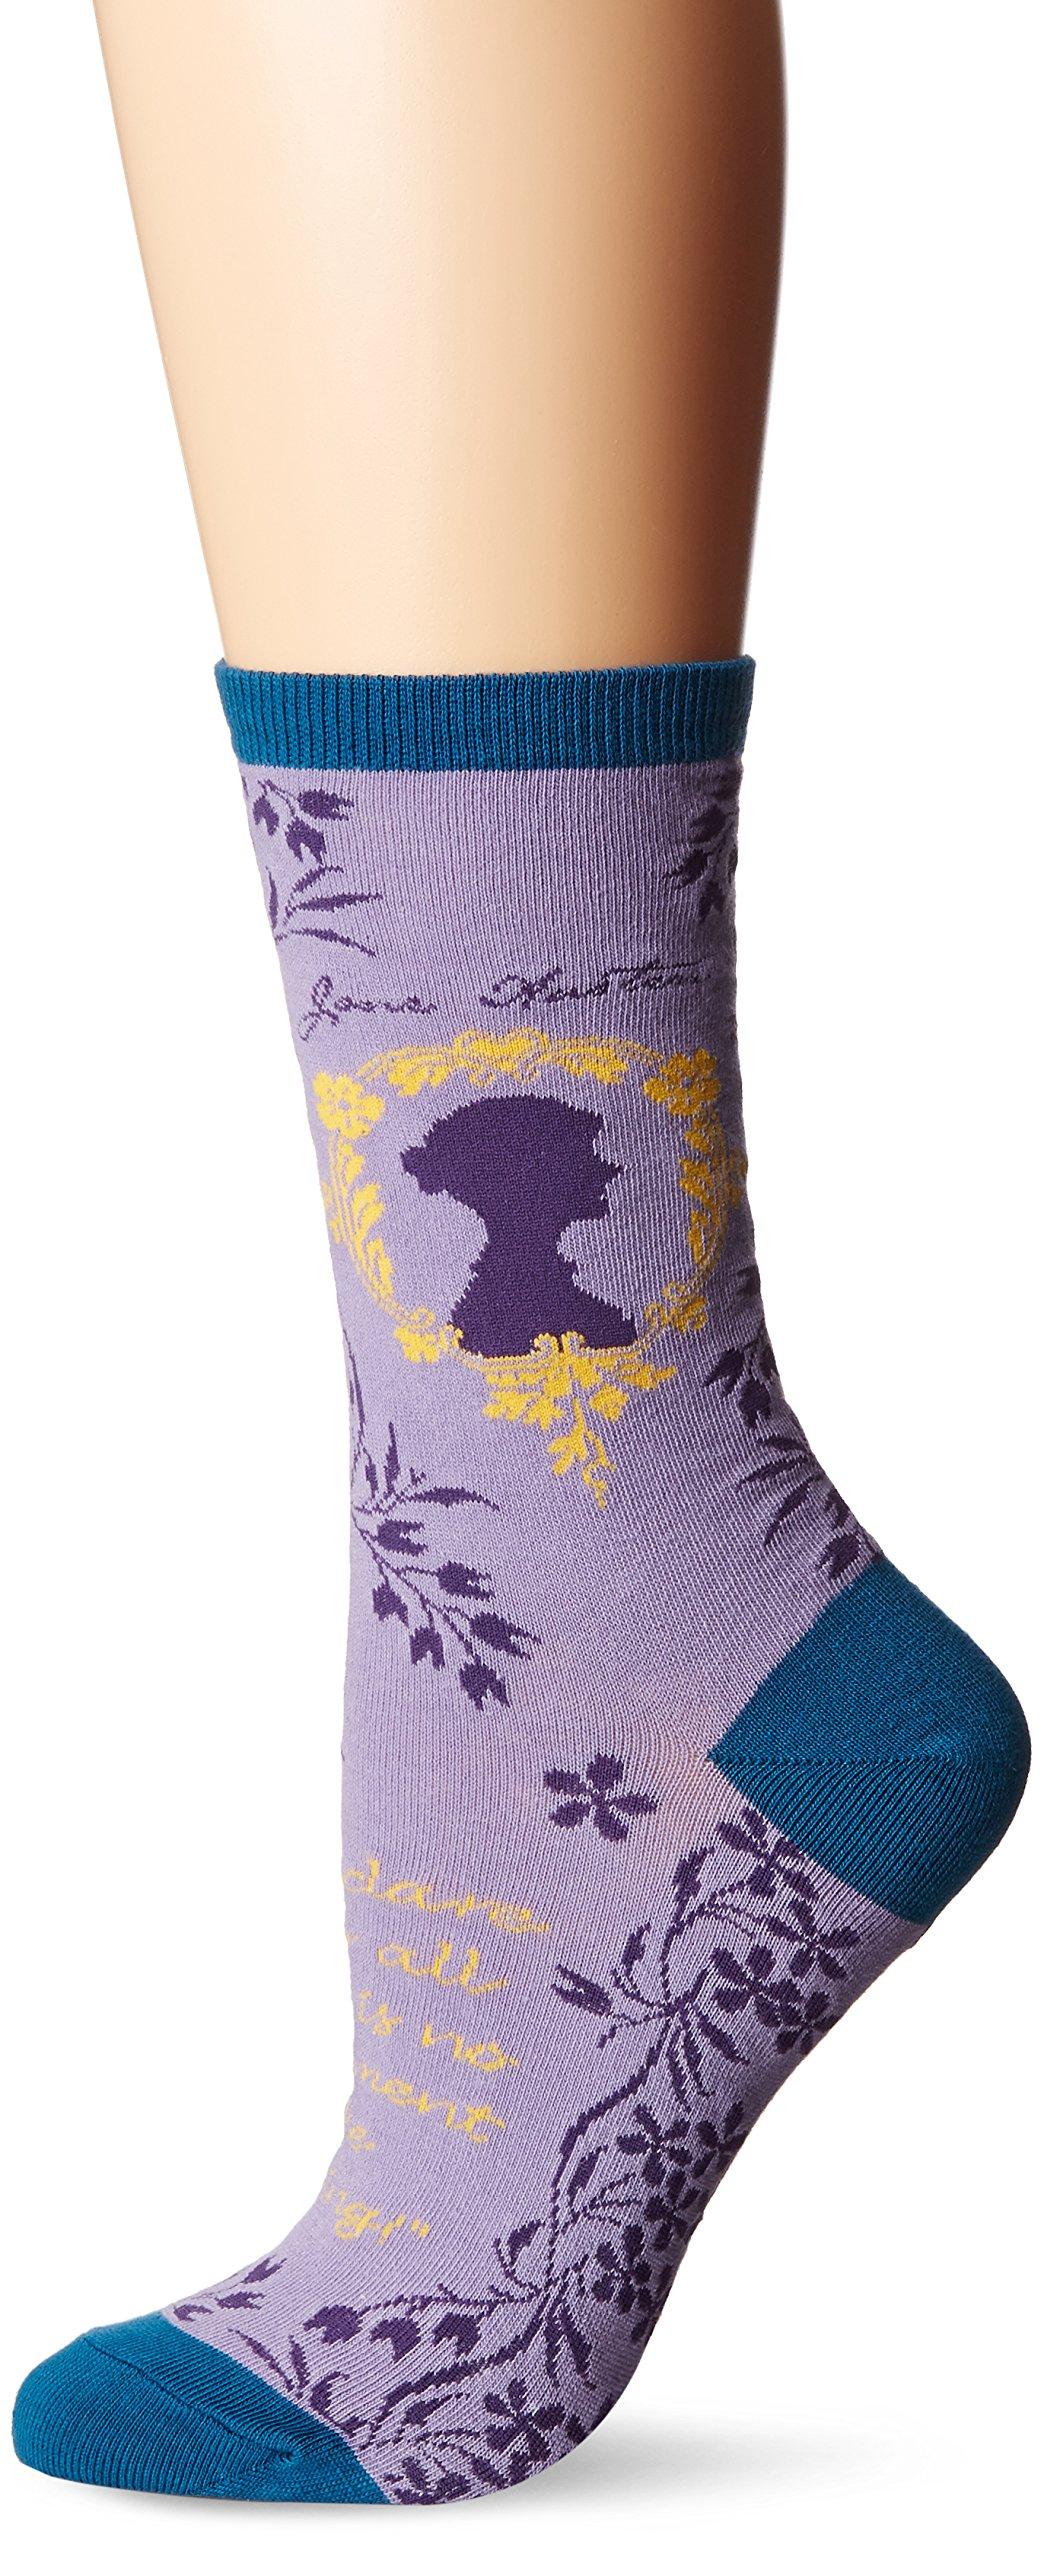 Socksmith Womens Jane Austen